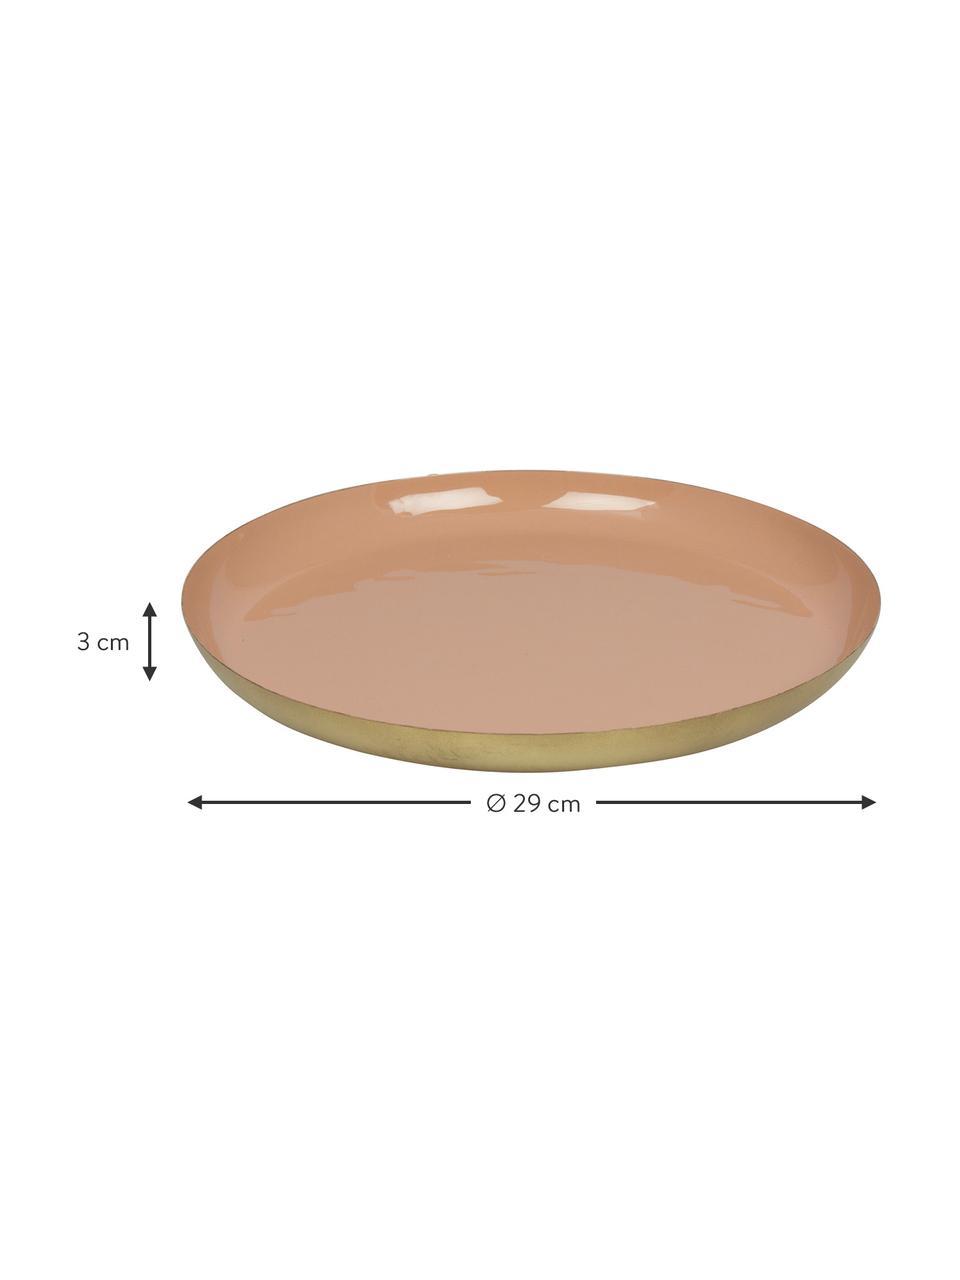 Deko-Tablett Julienne, Metall, beschichtet, Innen: PinkAußen: Goldfarben, Ø 29 x H 3 cm